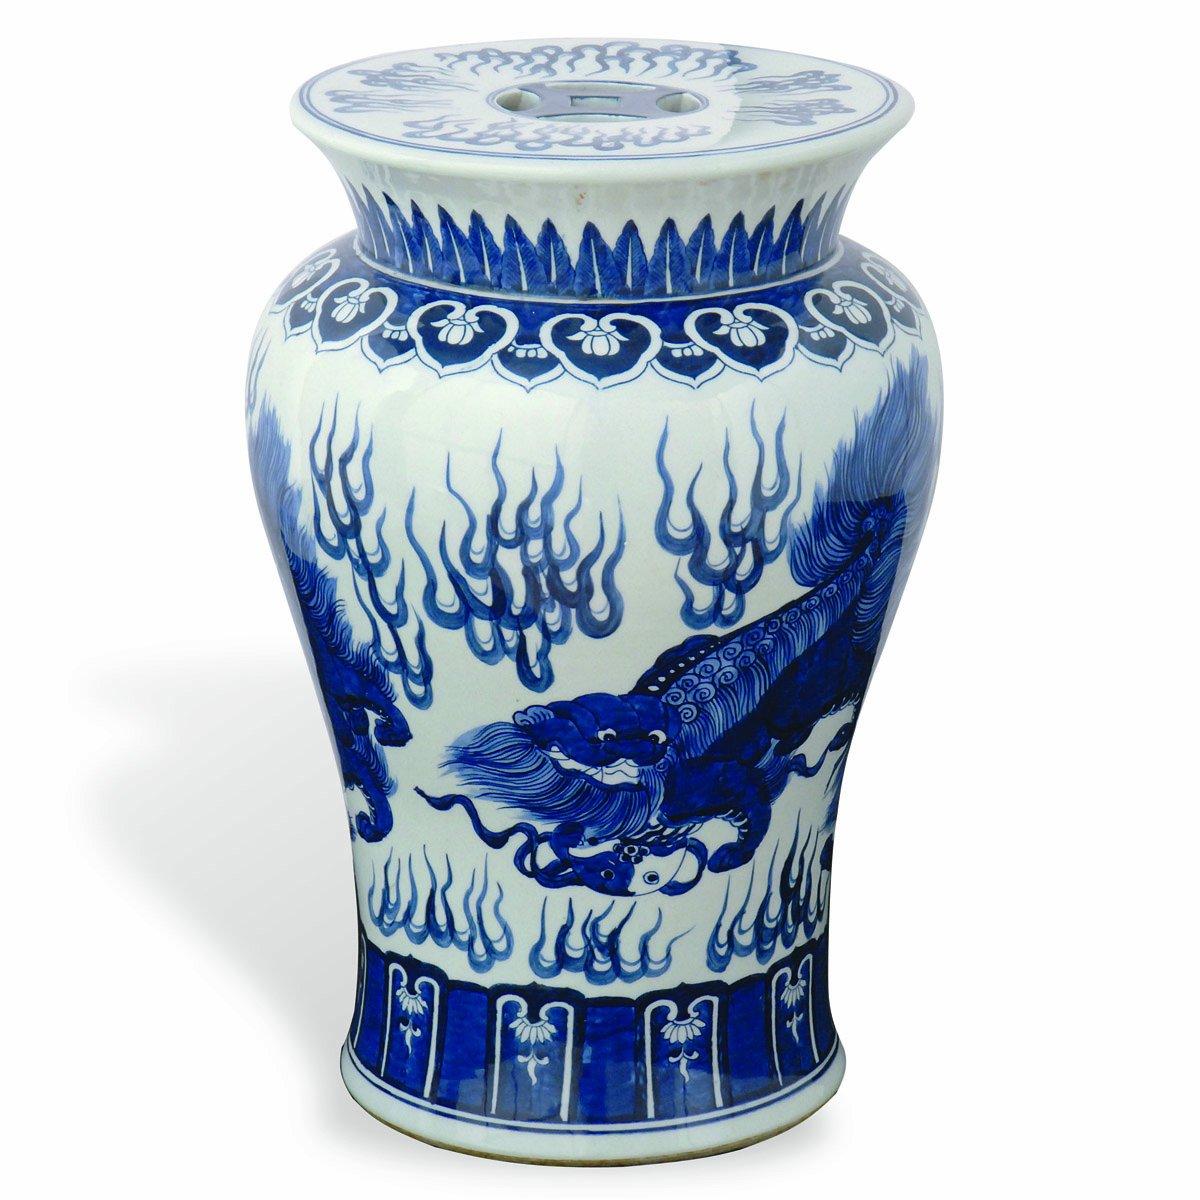 Amazoncom Port 68 Chow Garden Stool Blue 21Inch Tall Kitchen